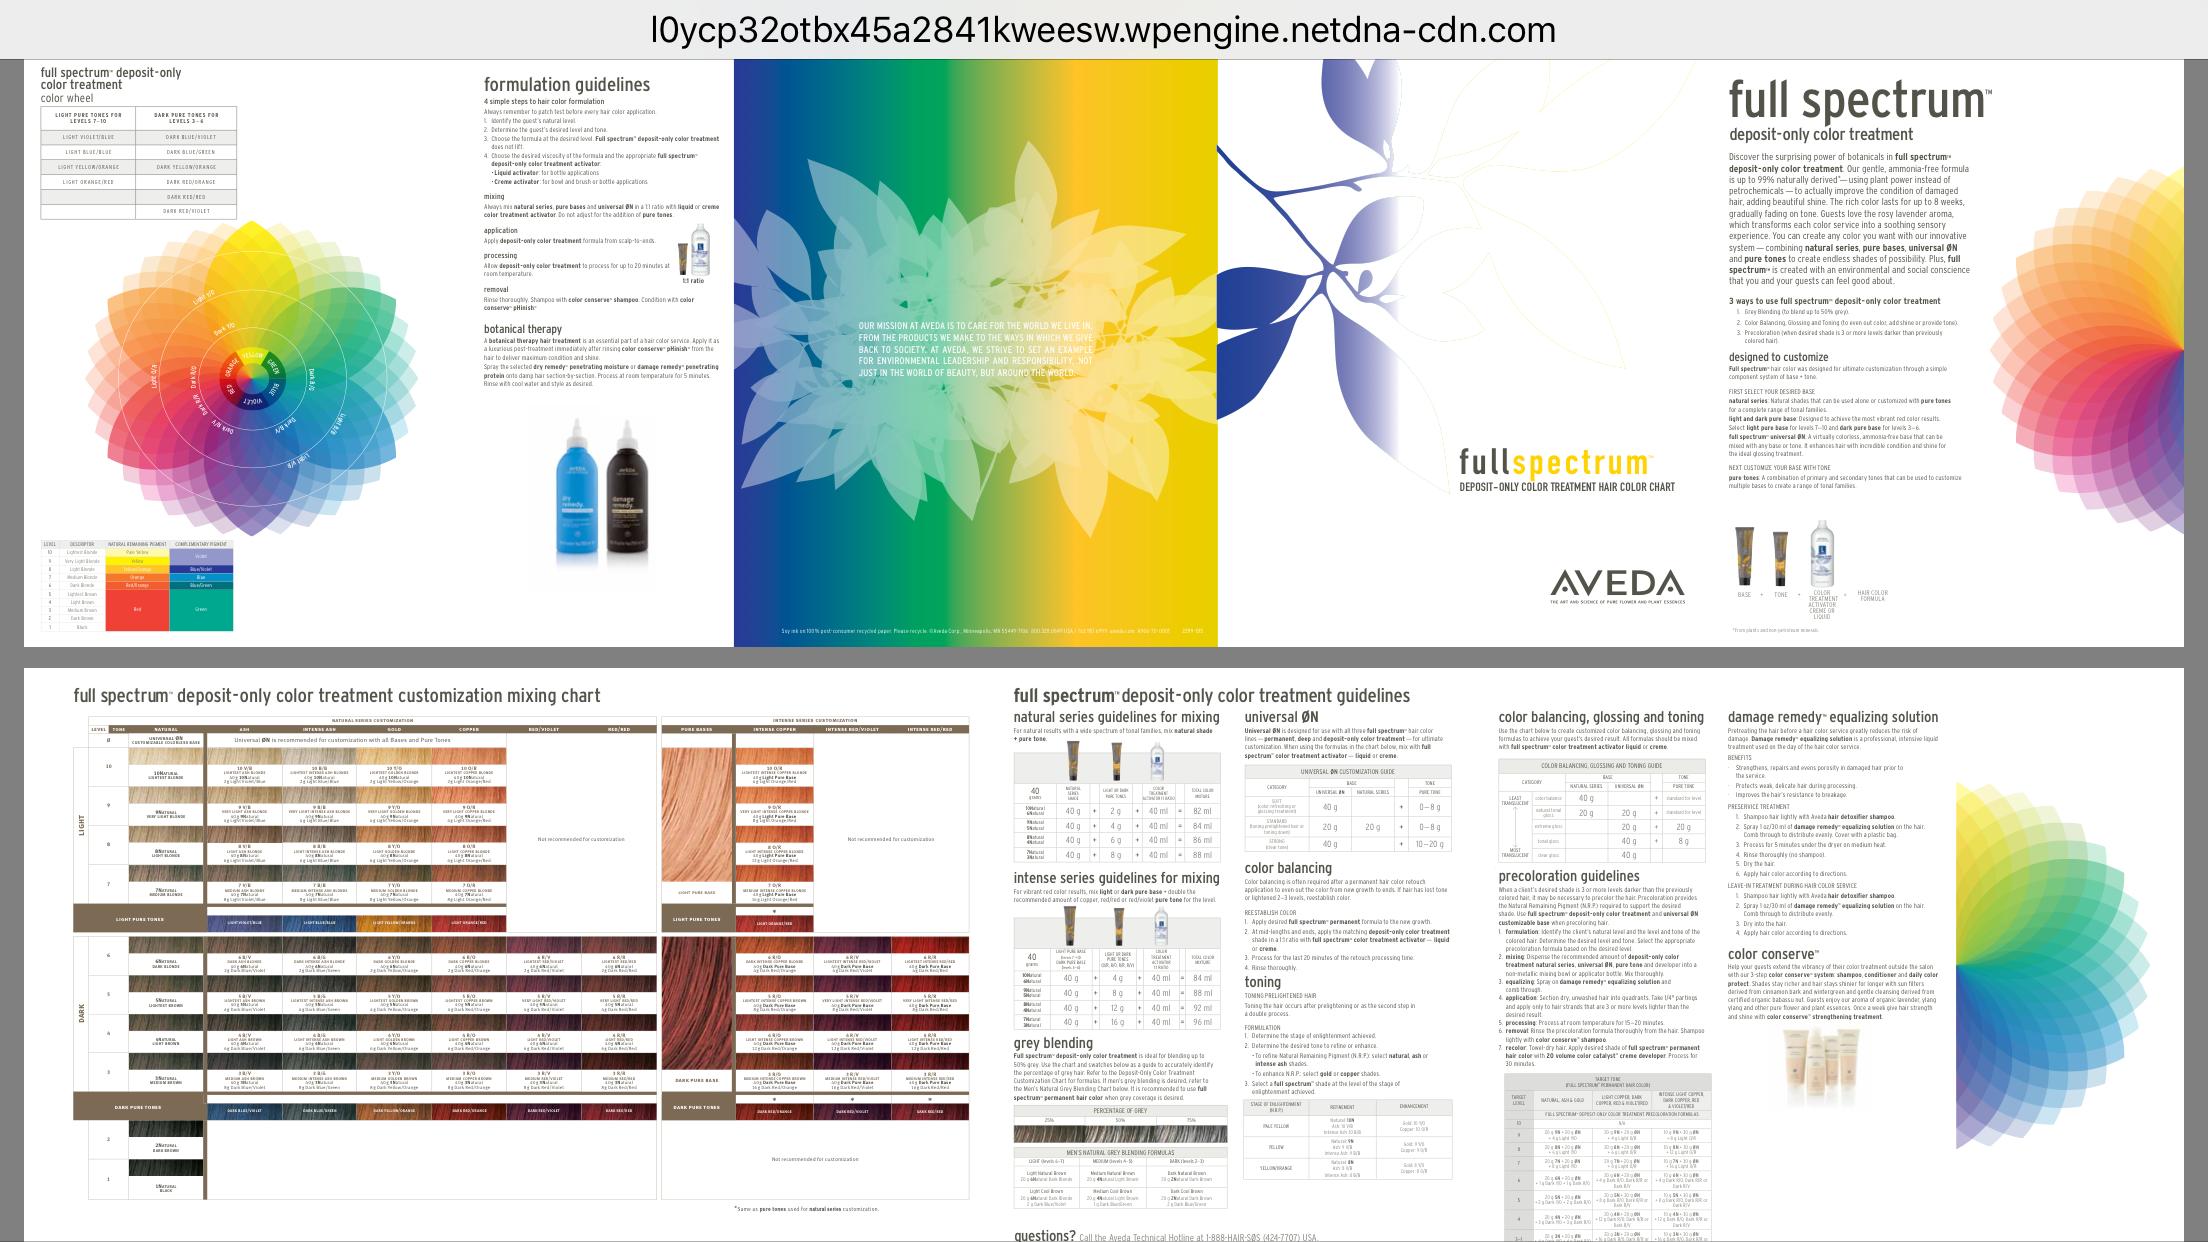 Aveda hair color chart | Aveda hair color, Aveda color ...